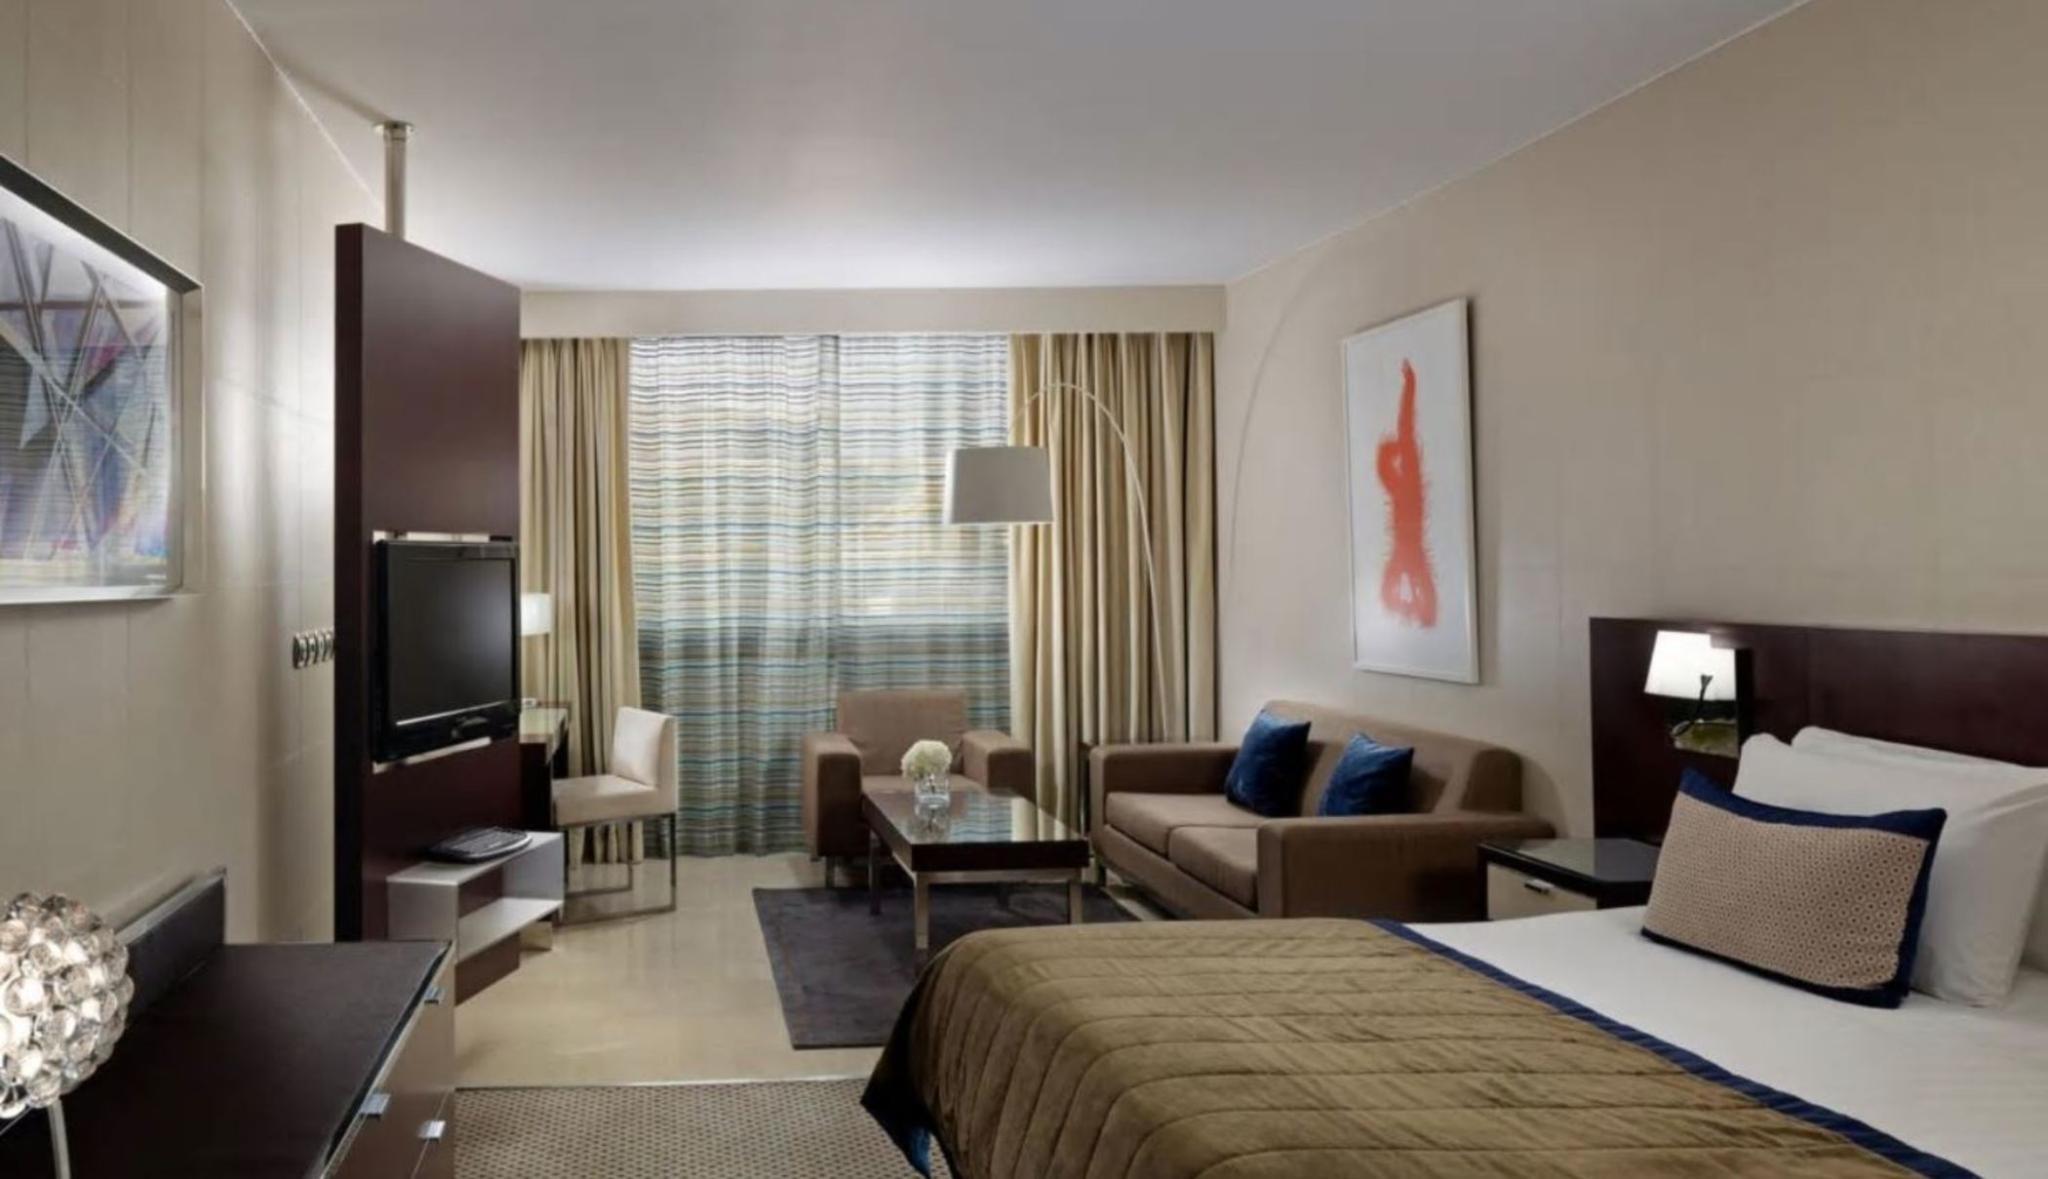 Room 1 KING BED DELUXE ROOM